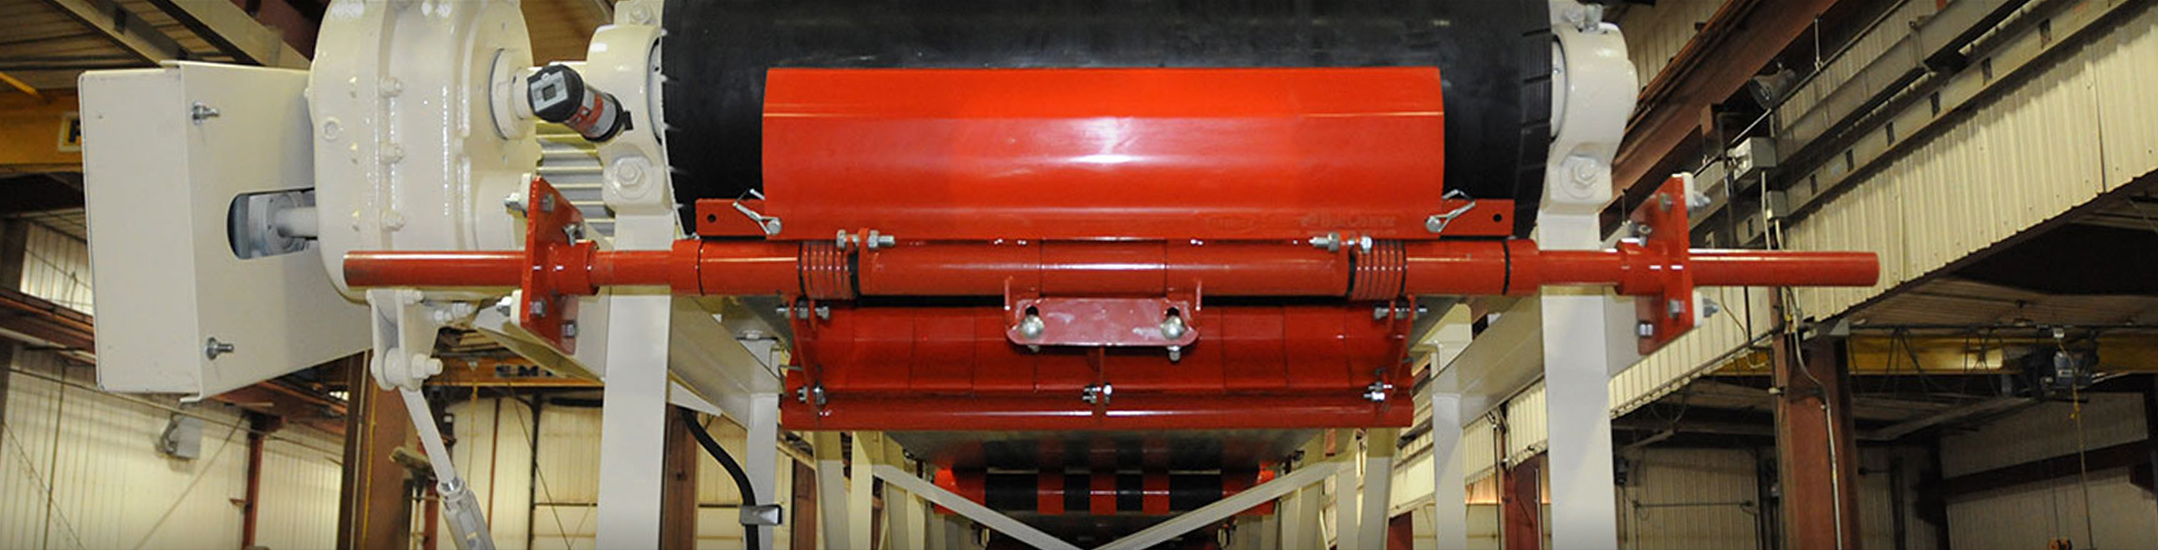 Exterra® SFL Dual Belt Cleaner by Superior Industries